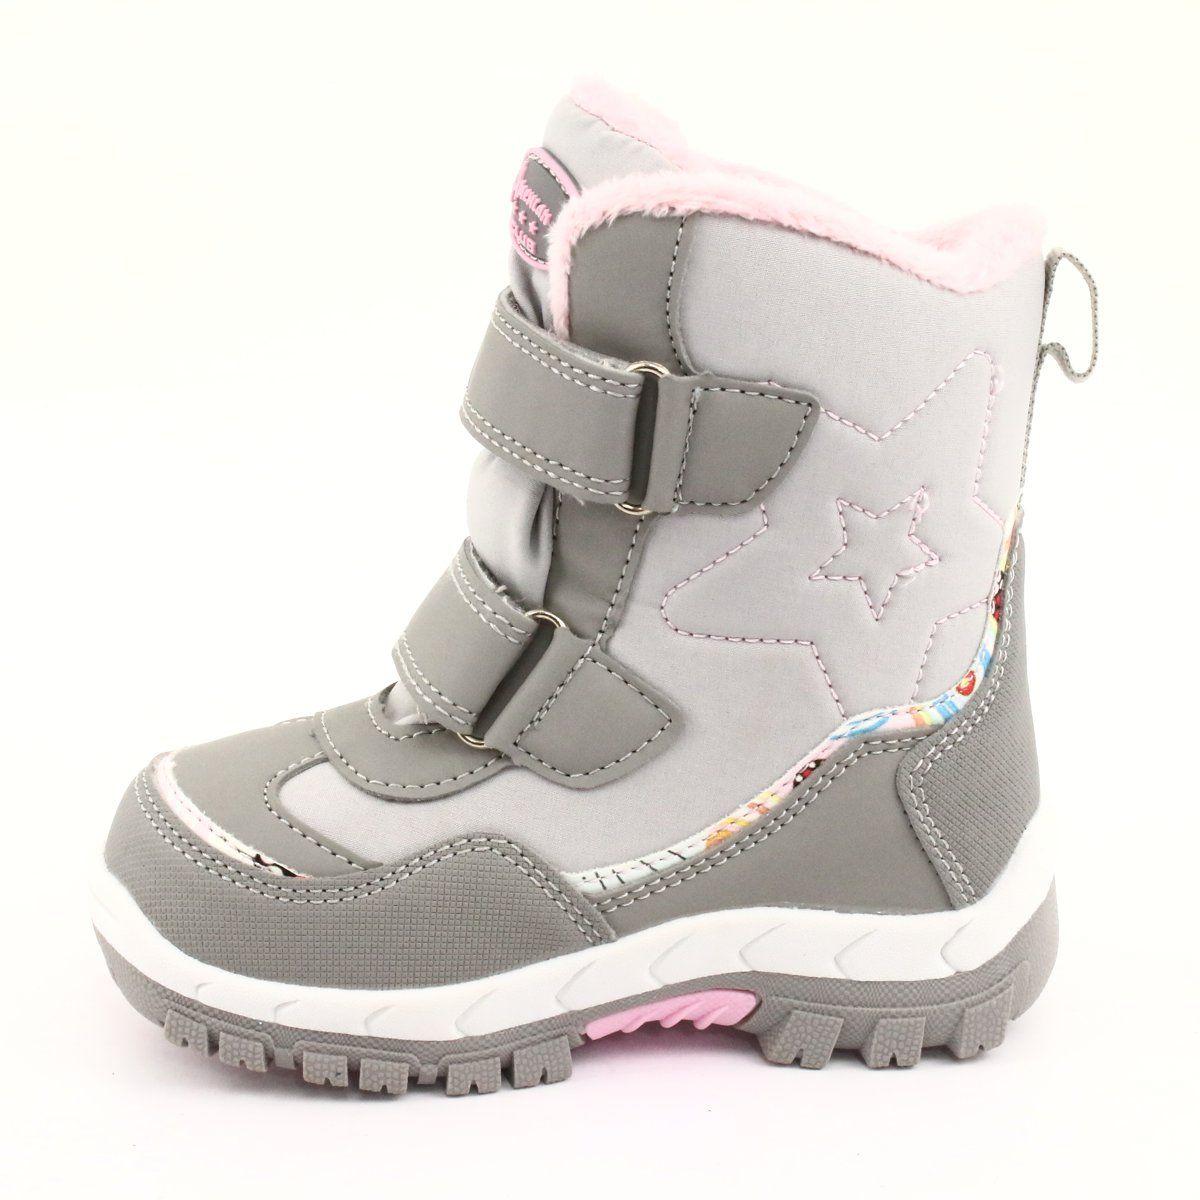 American Club Kozaki Z Membrana Rl37 Gwiazda Szare Rozowe Boots Childrens Boots Kid Shoes